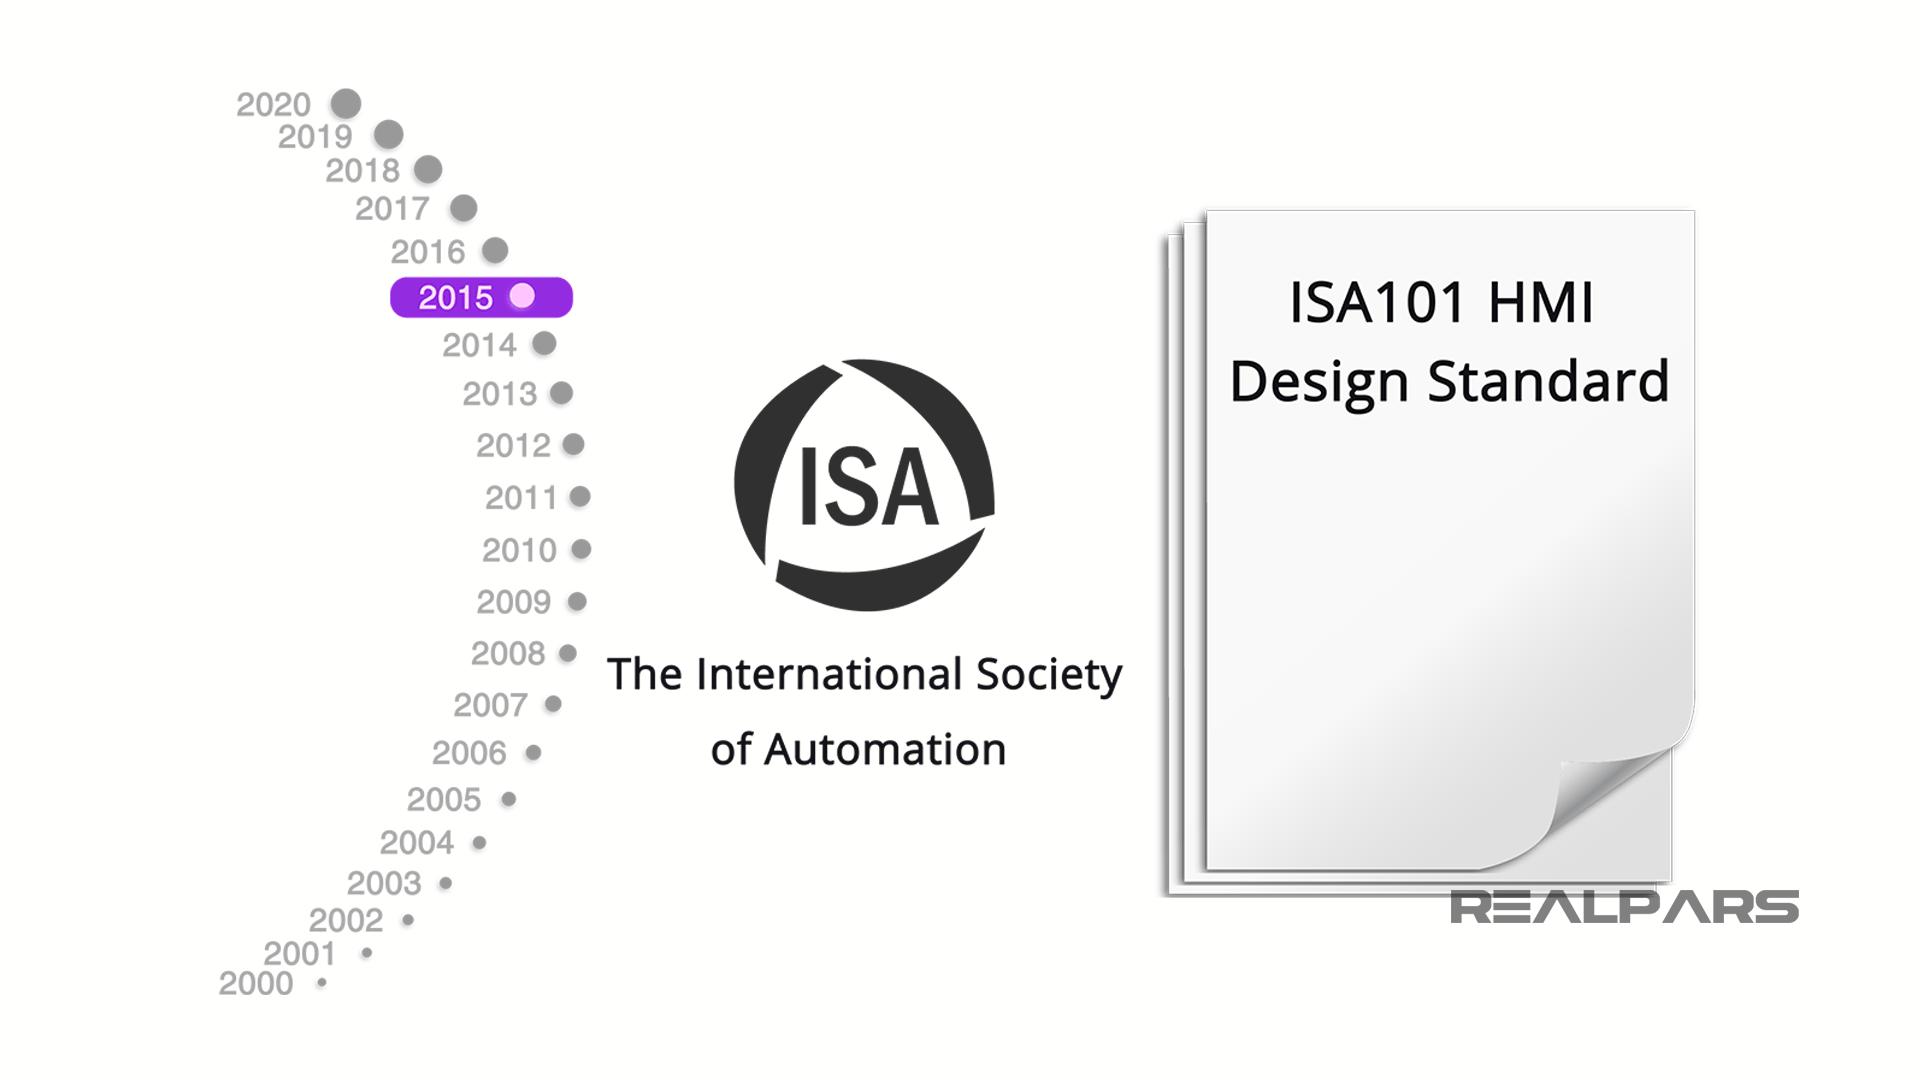 ISA-101 HMI Design Standard